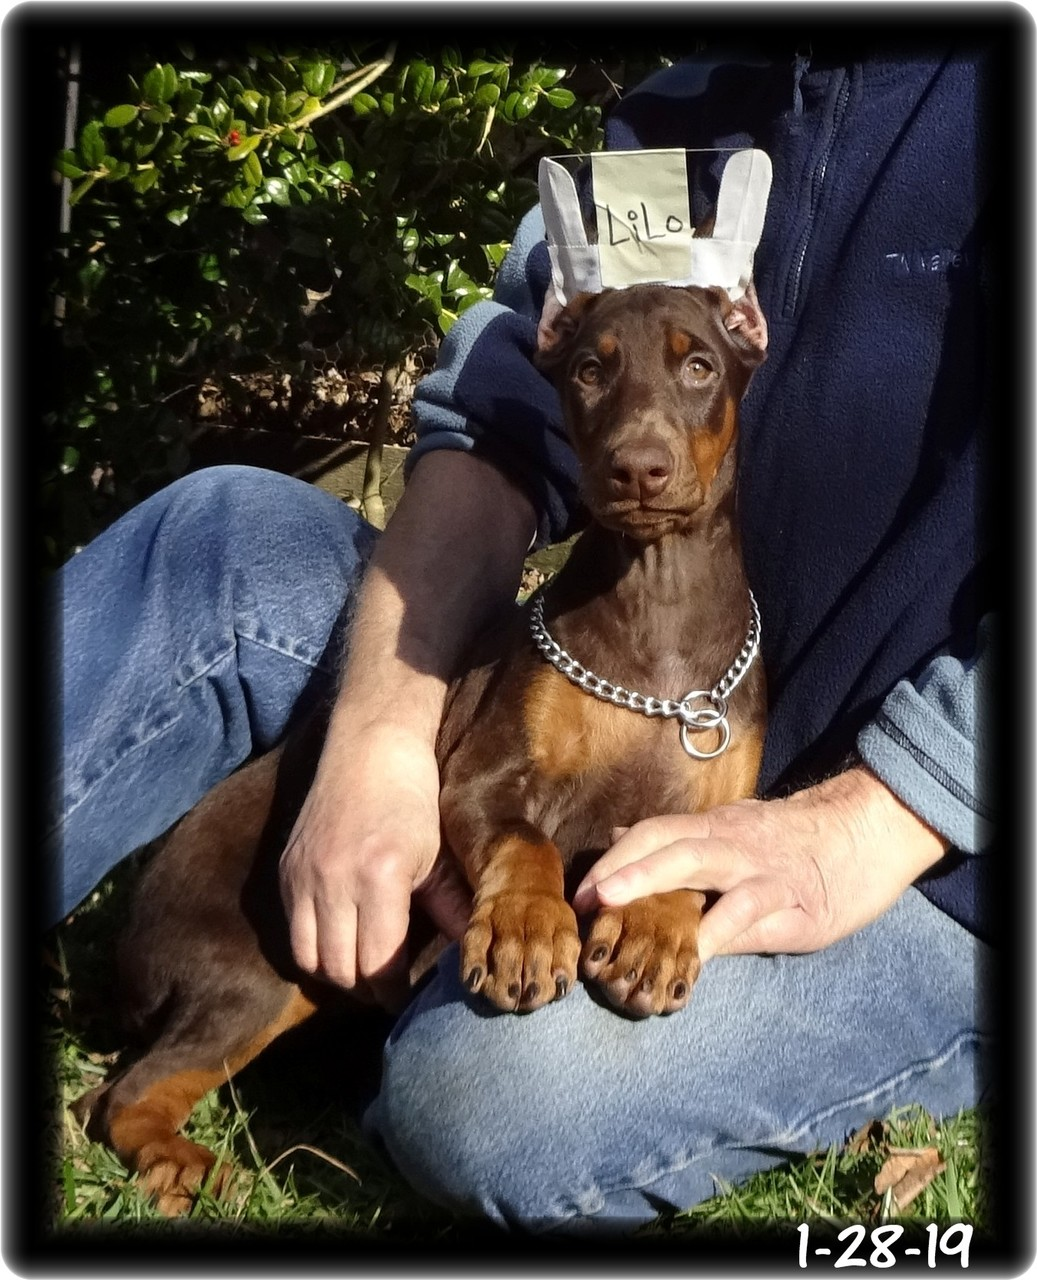 Lilo - Delilah & Major pup - born 11-12-18 ... available